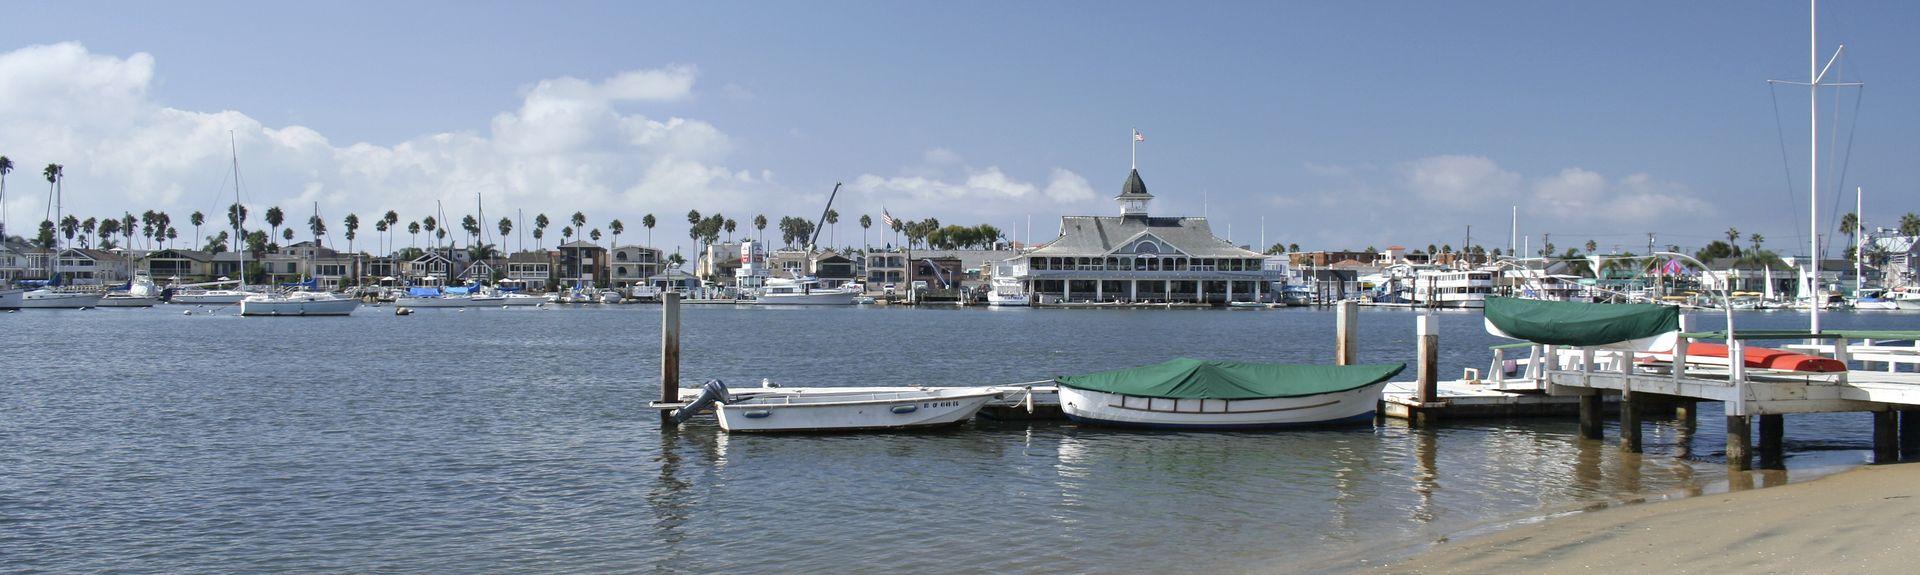 Balboa Island, Newport Beach, California, United States of America